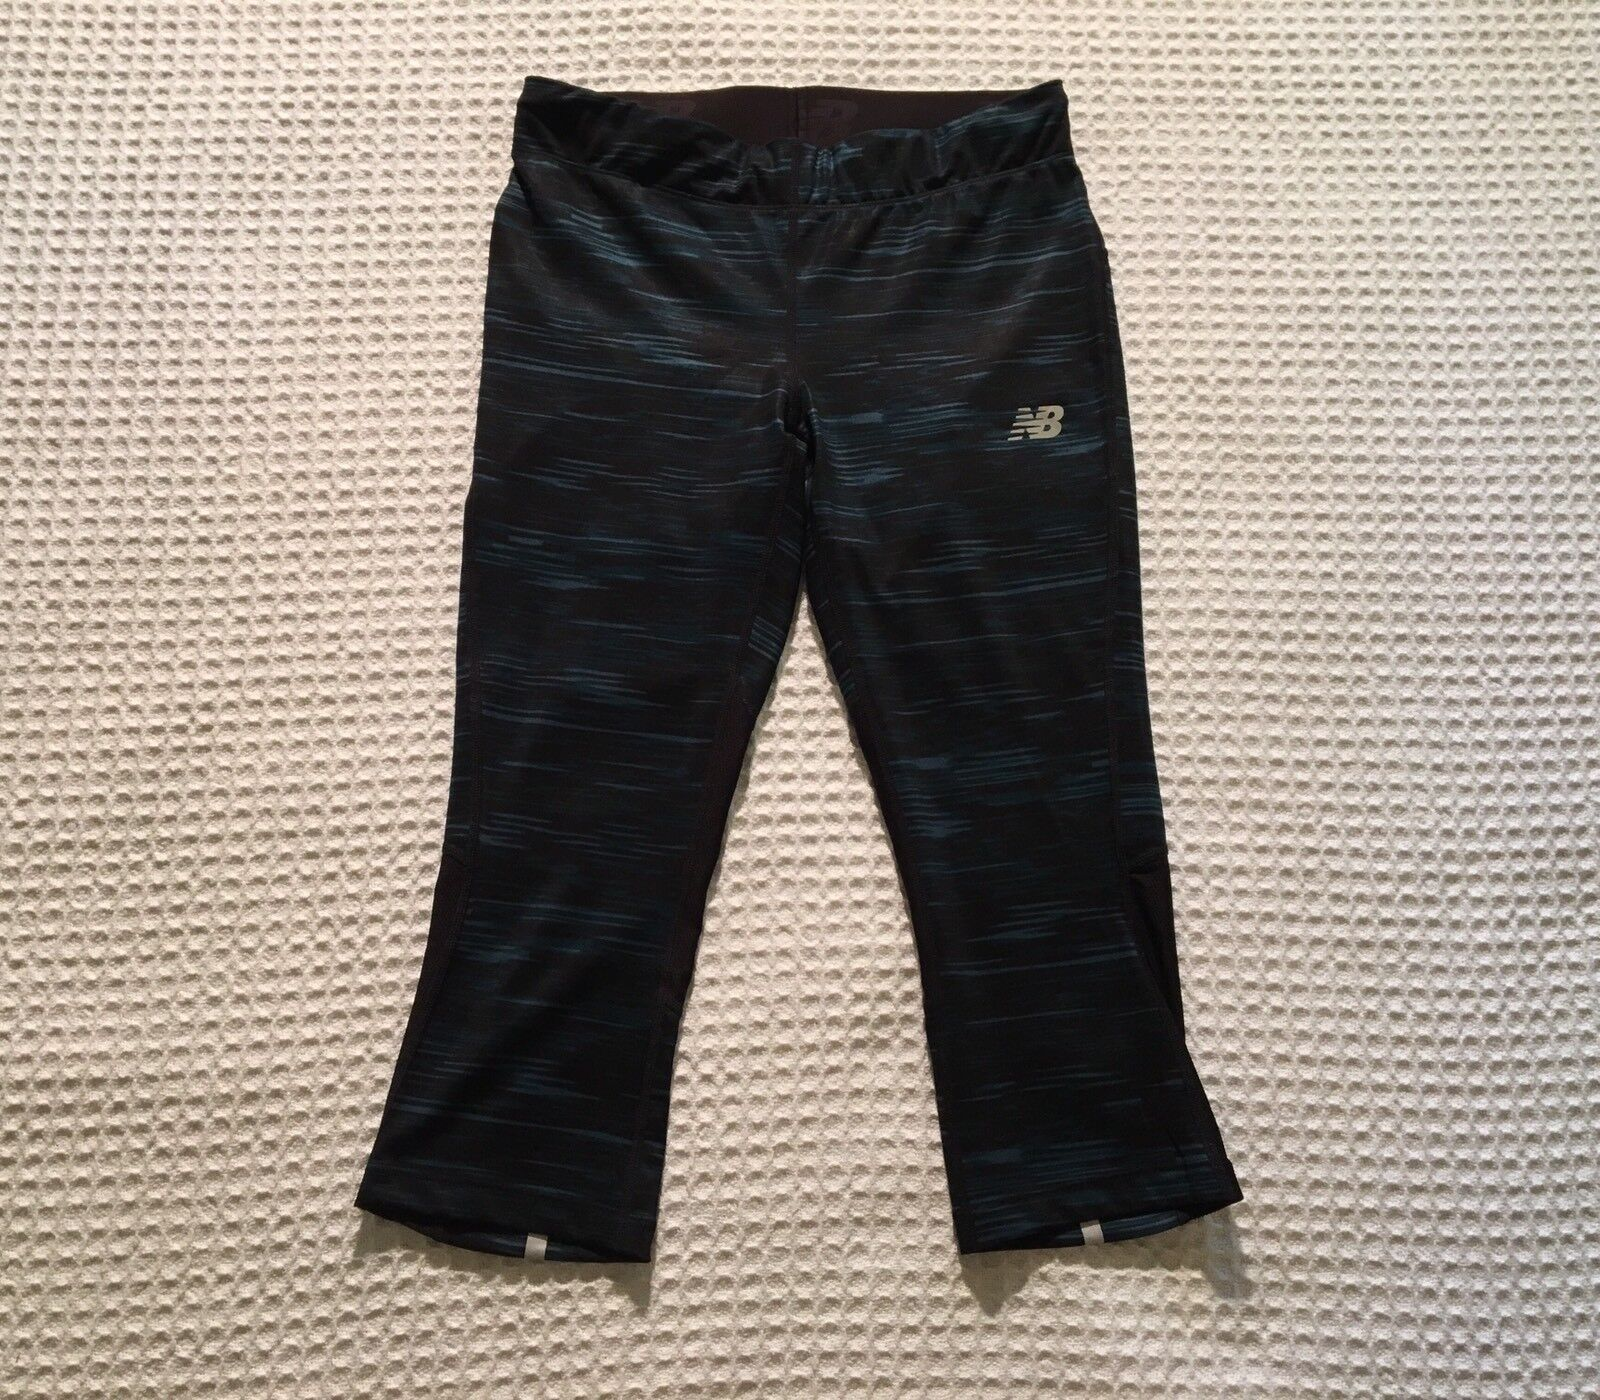 NB New Balance Impact Stripe Running Capri Cropped Leggings Black / Blue S Small